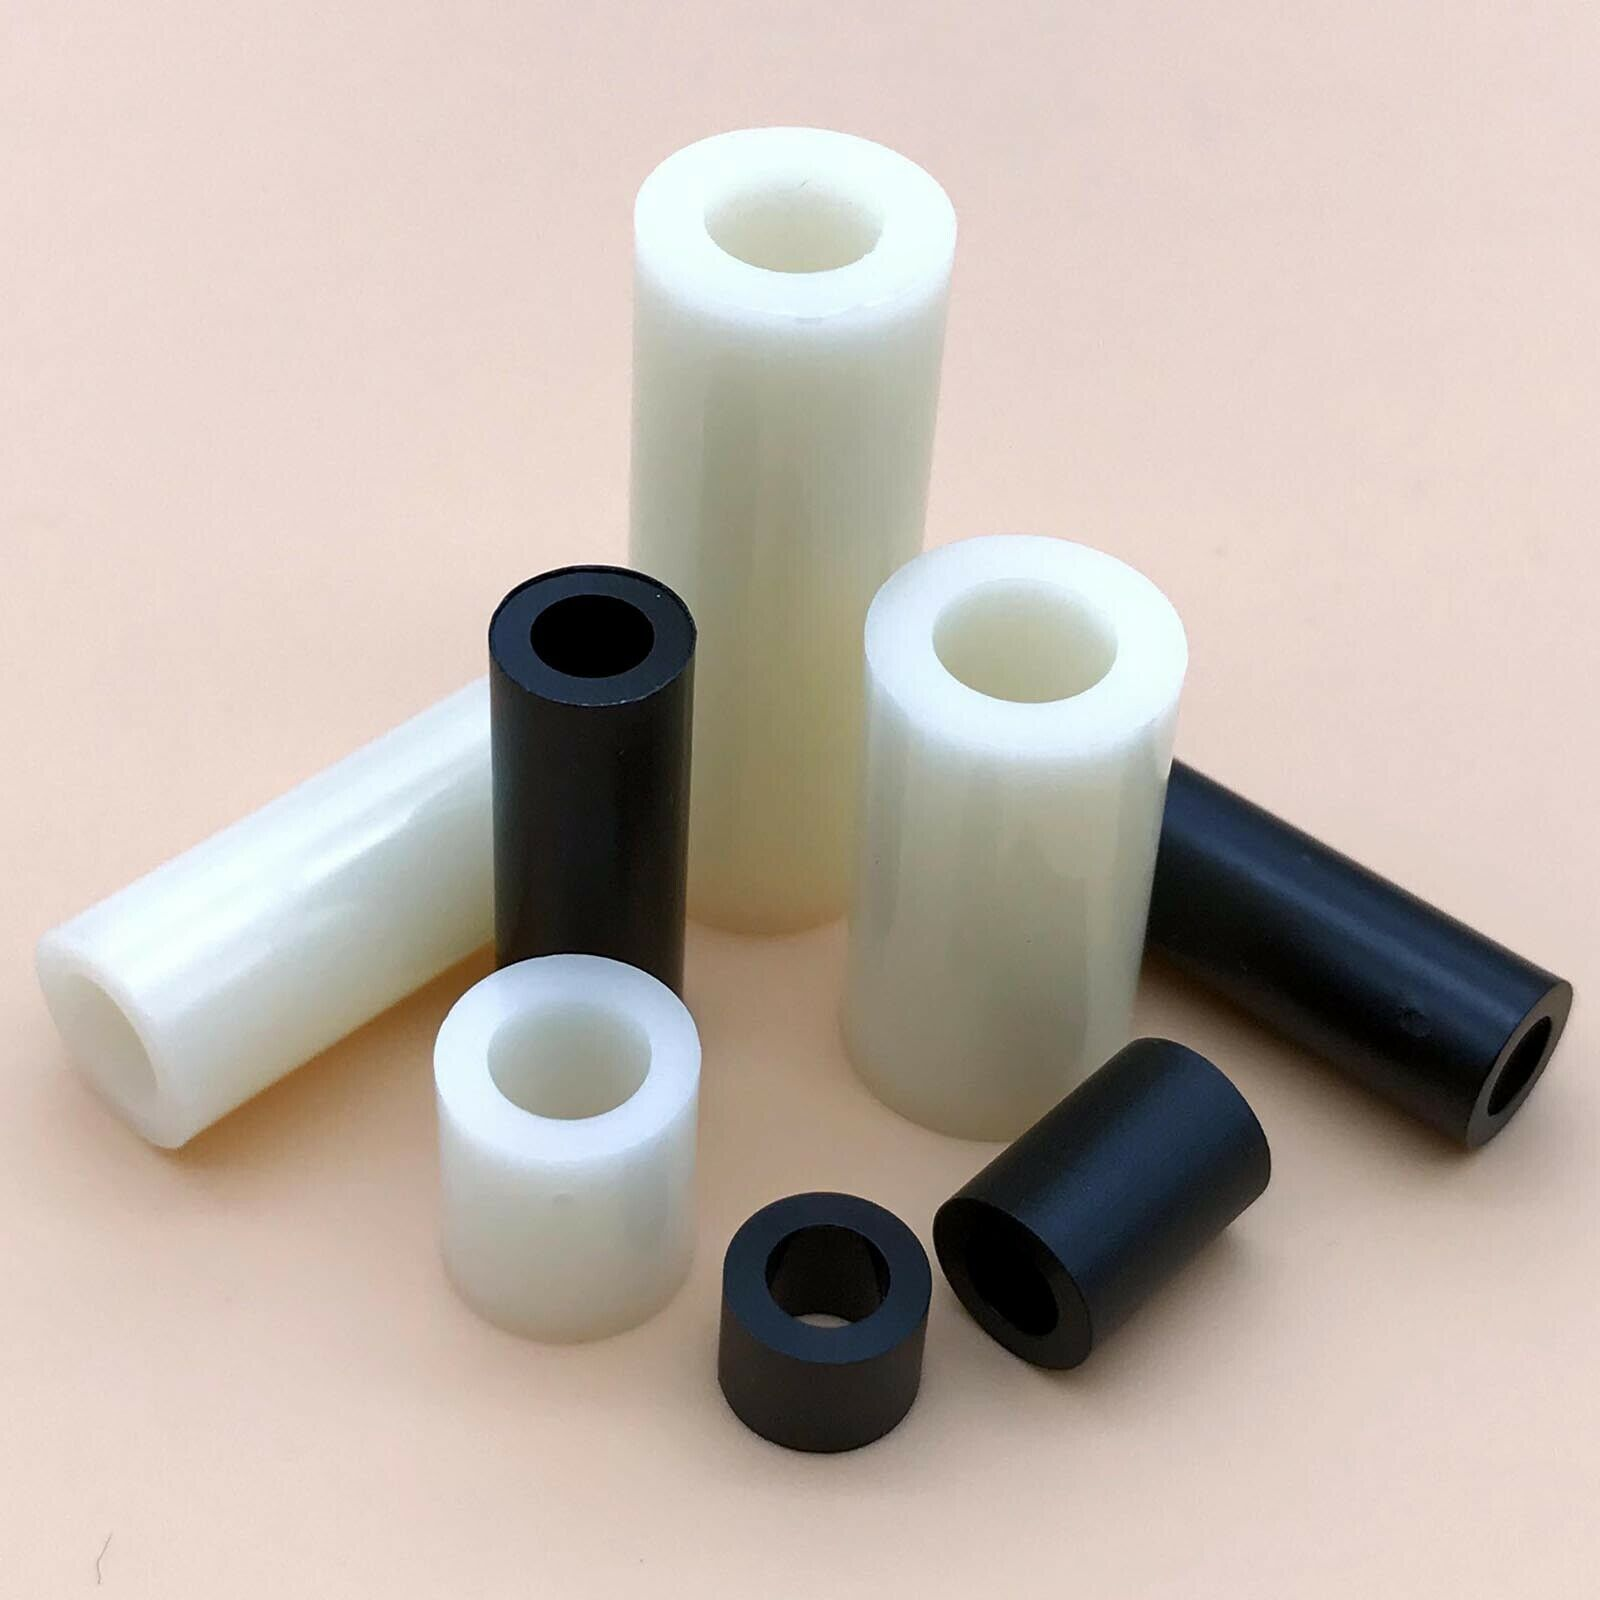 ID 3.2mm for M3 Screws Not Threaded 100PCS 11mm Black Nylon Round Spacer OD 7mm Plastic.